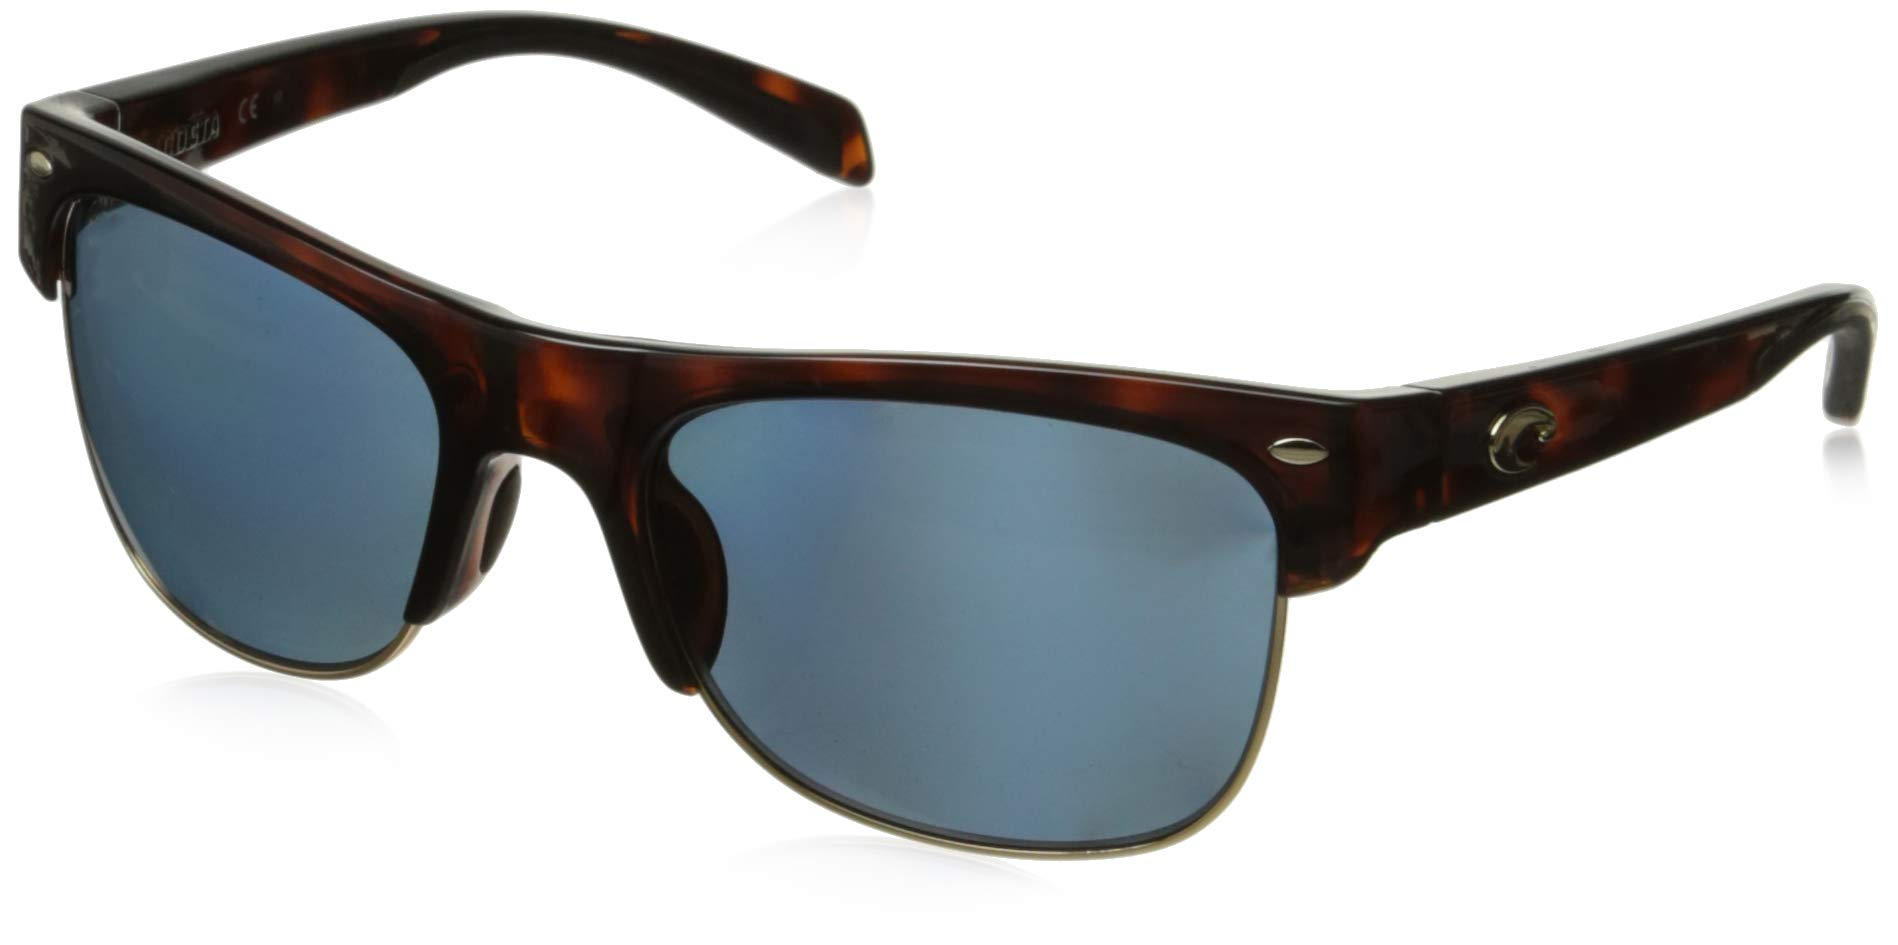 Costa del Mar Unisex-Adult Pawleys PW 66 OGP Polarized Oval Sunglasses, Retro Tortoise, 56.2 mm by Costa Del Mar